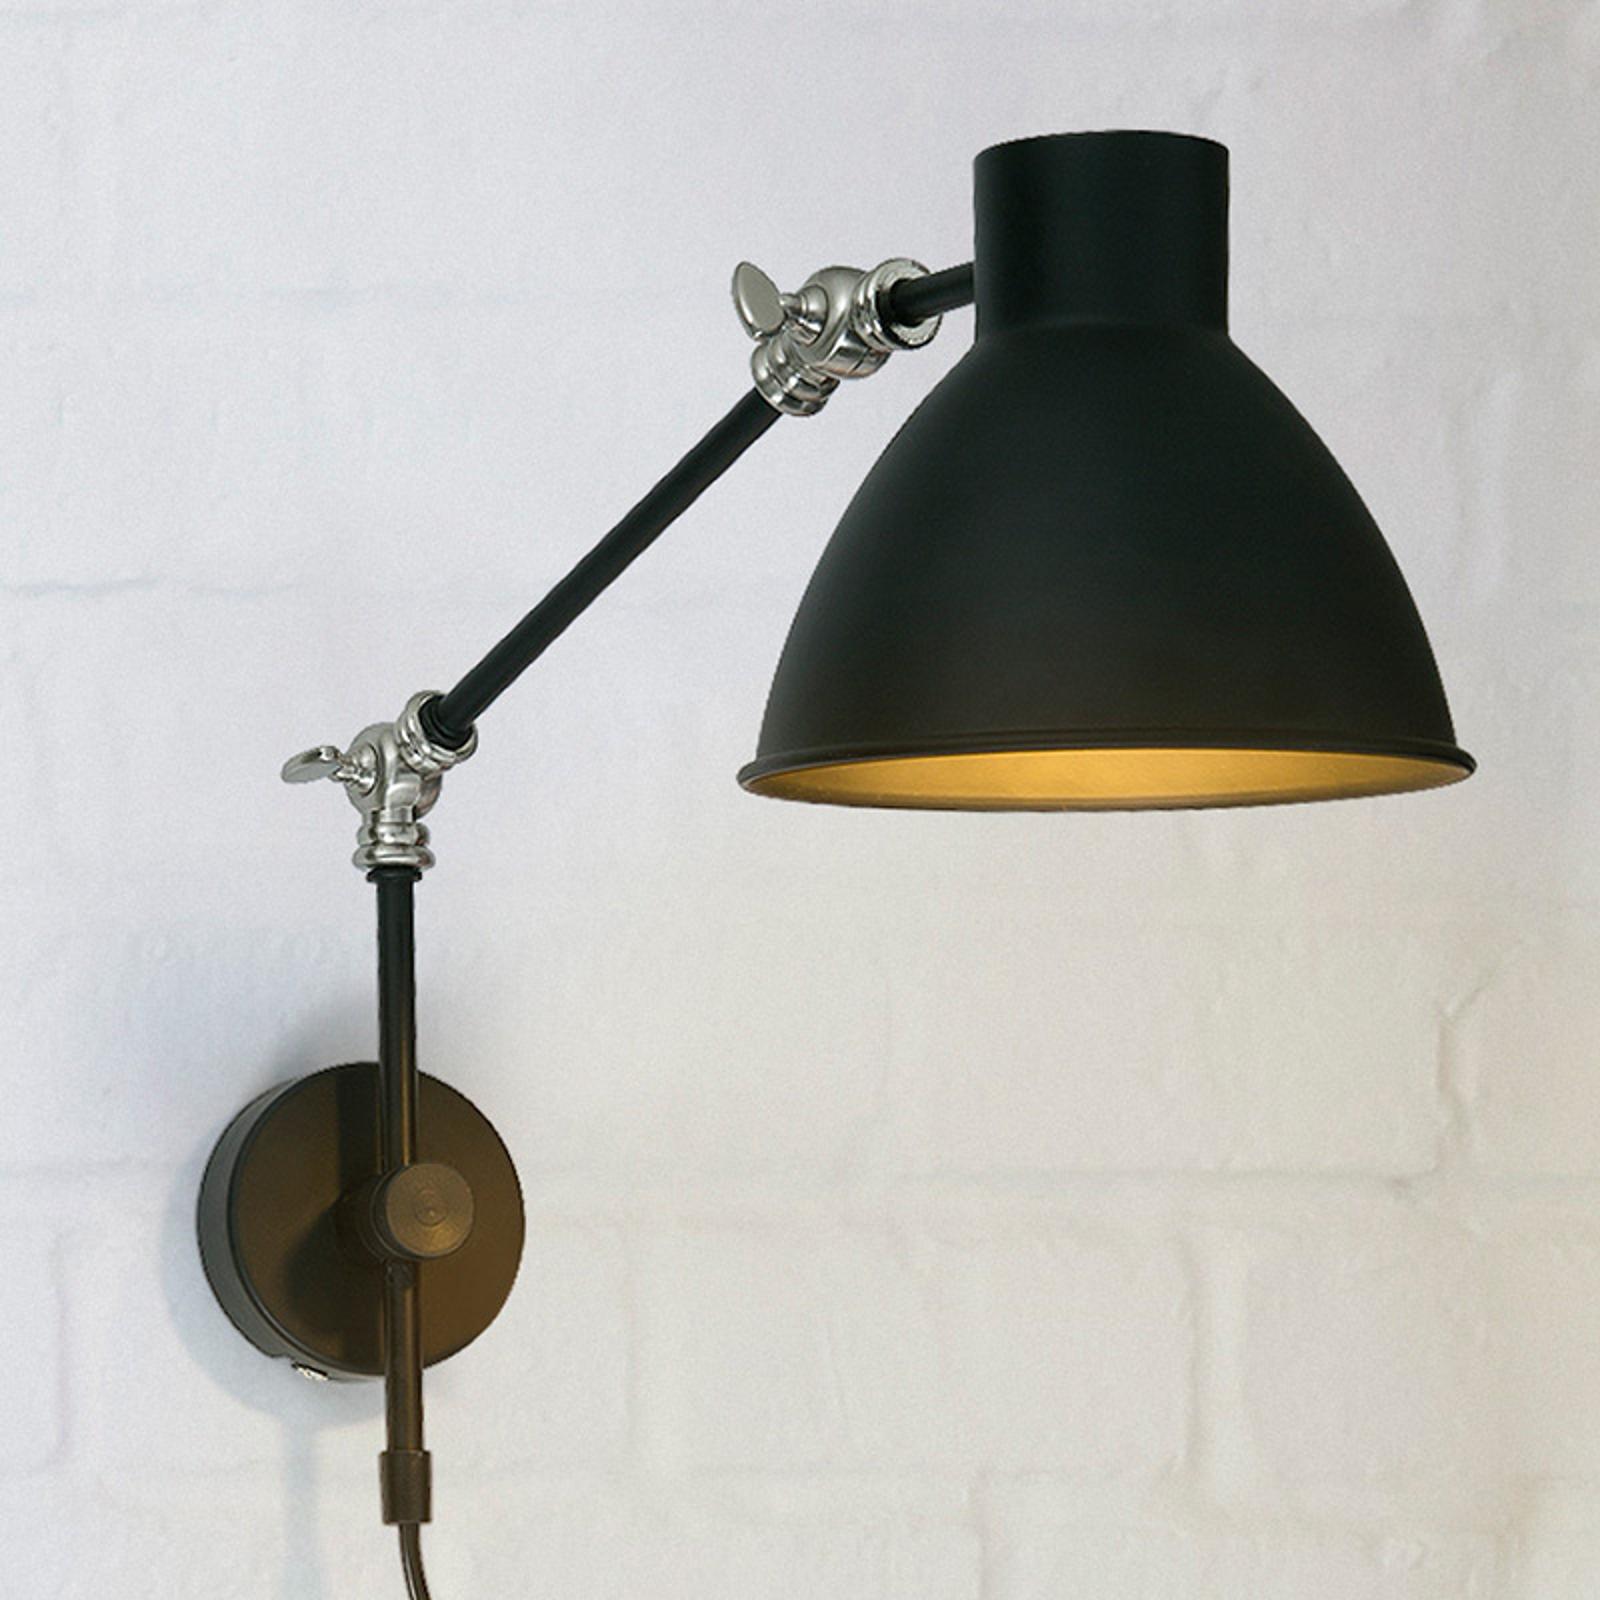 Celia-væglampe, justerbar, sort